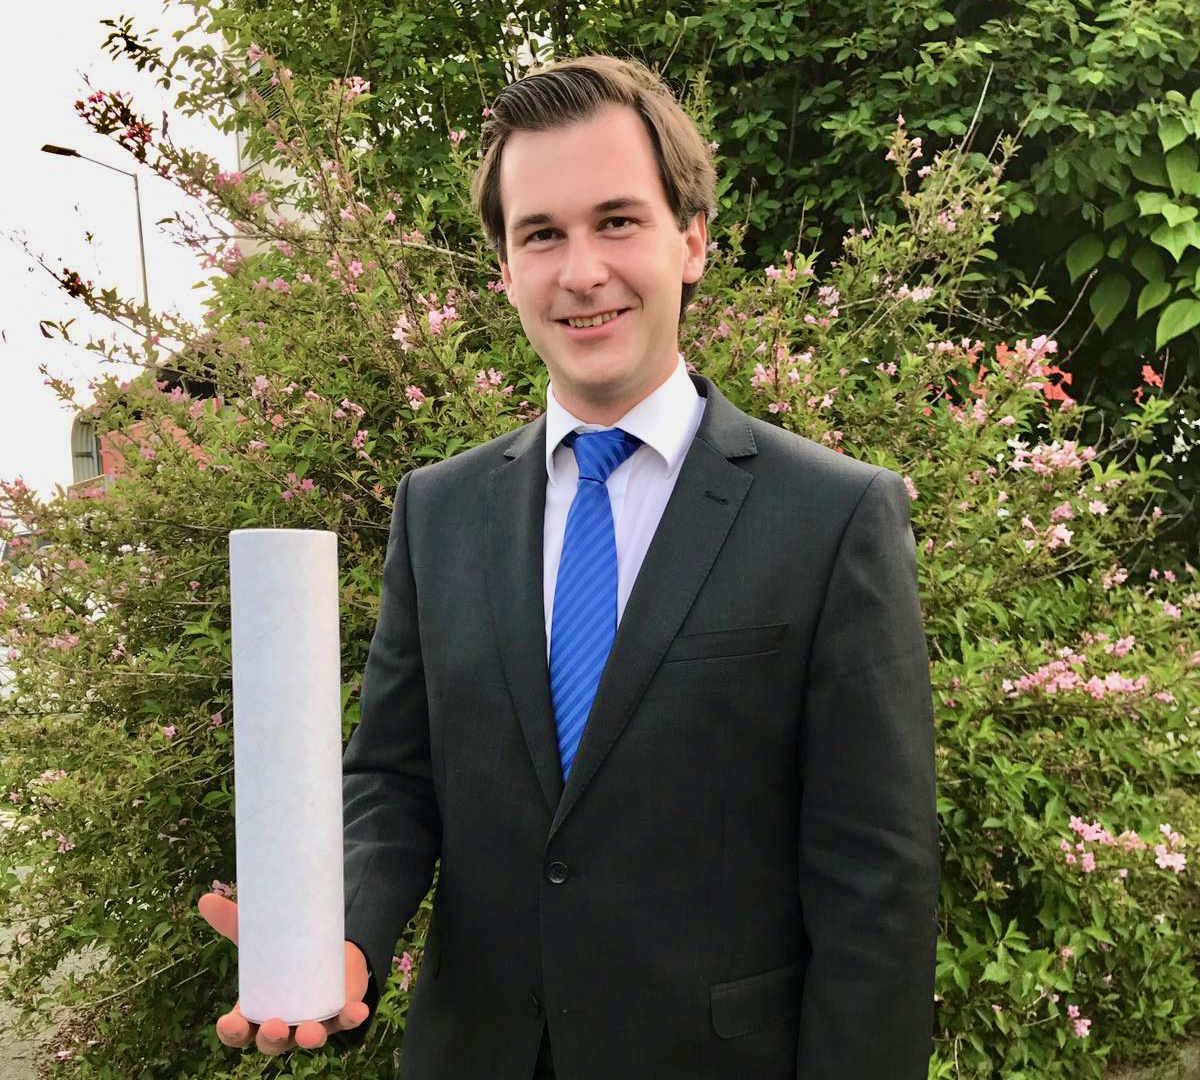 Daniel Sebastian Uschounig